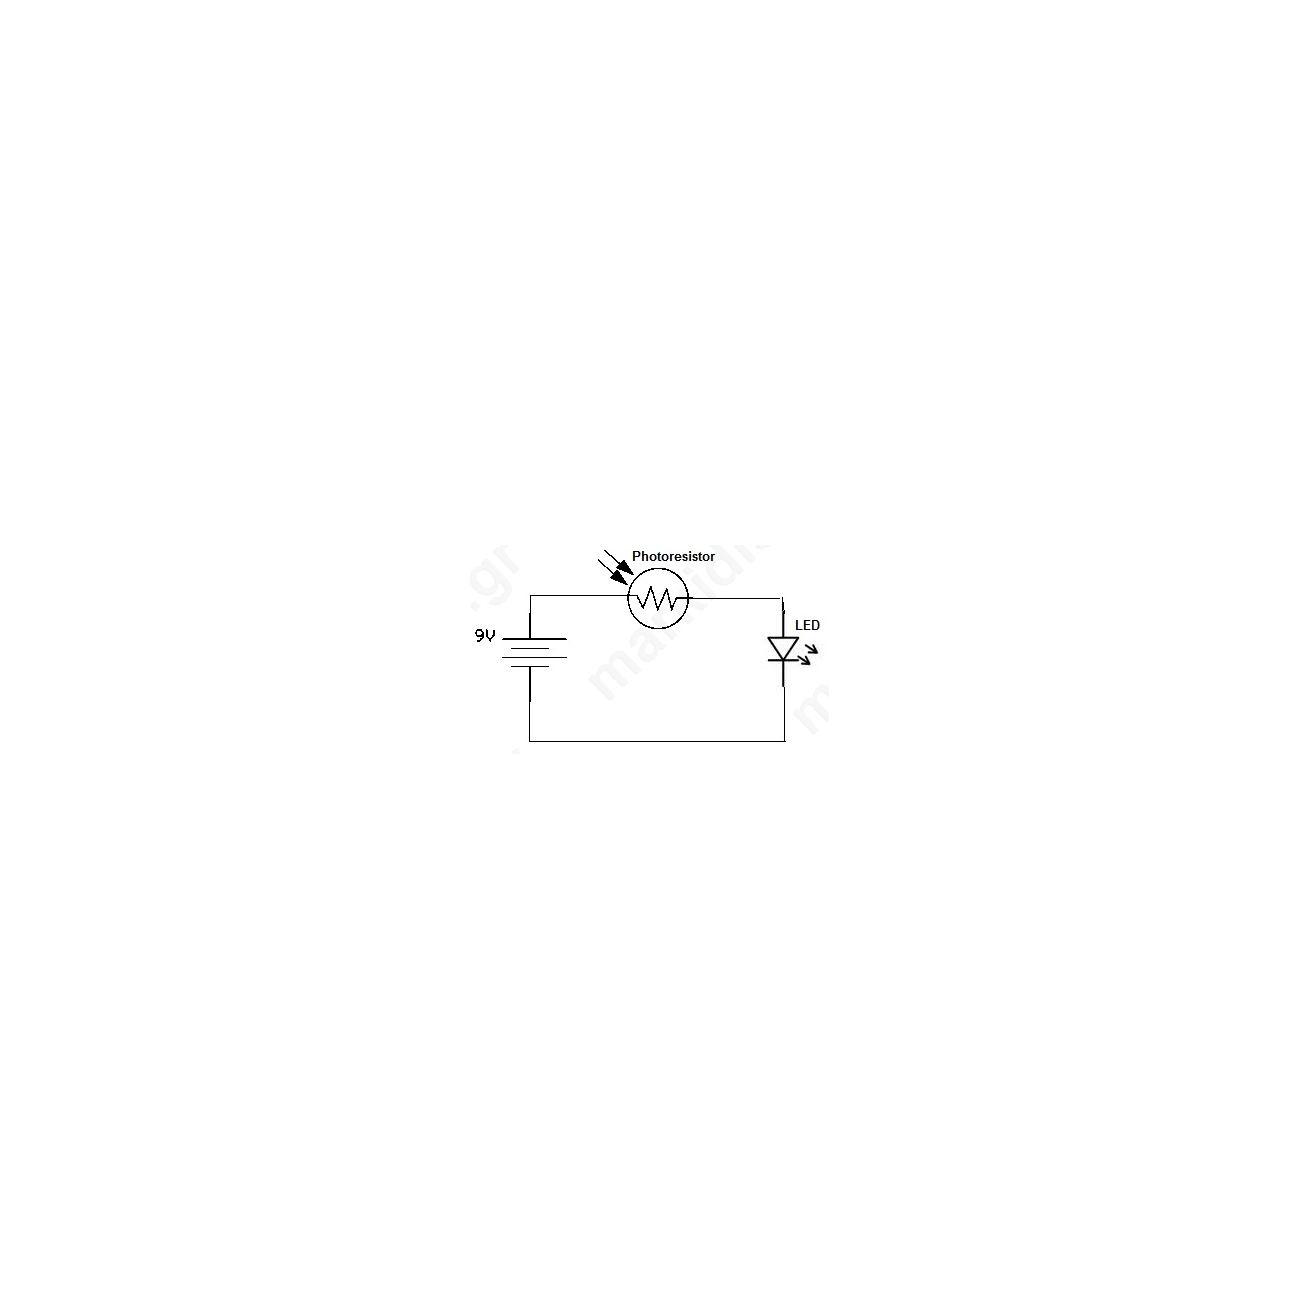 Simple Photoresistor Circuit